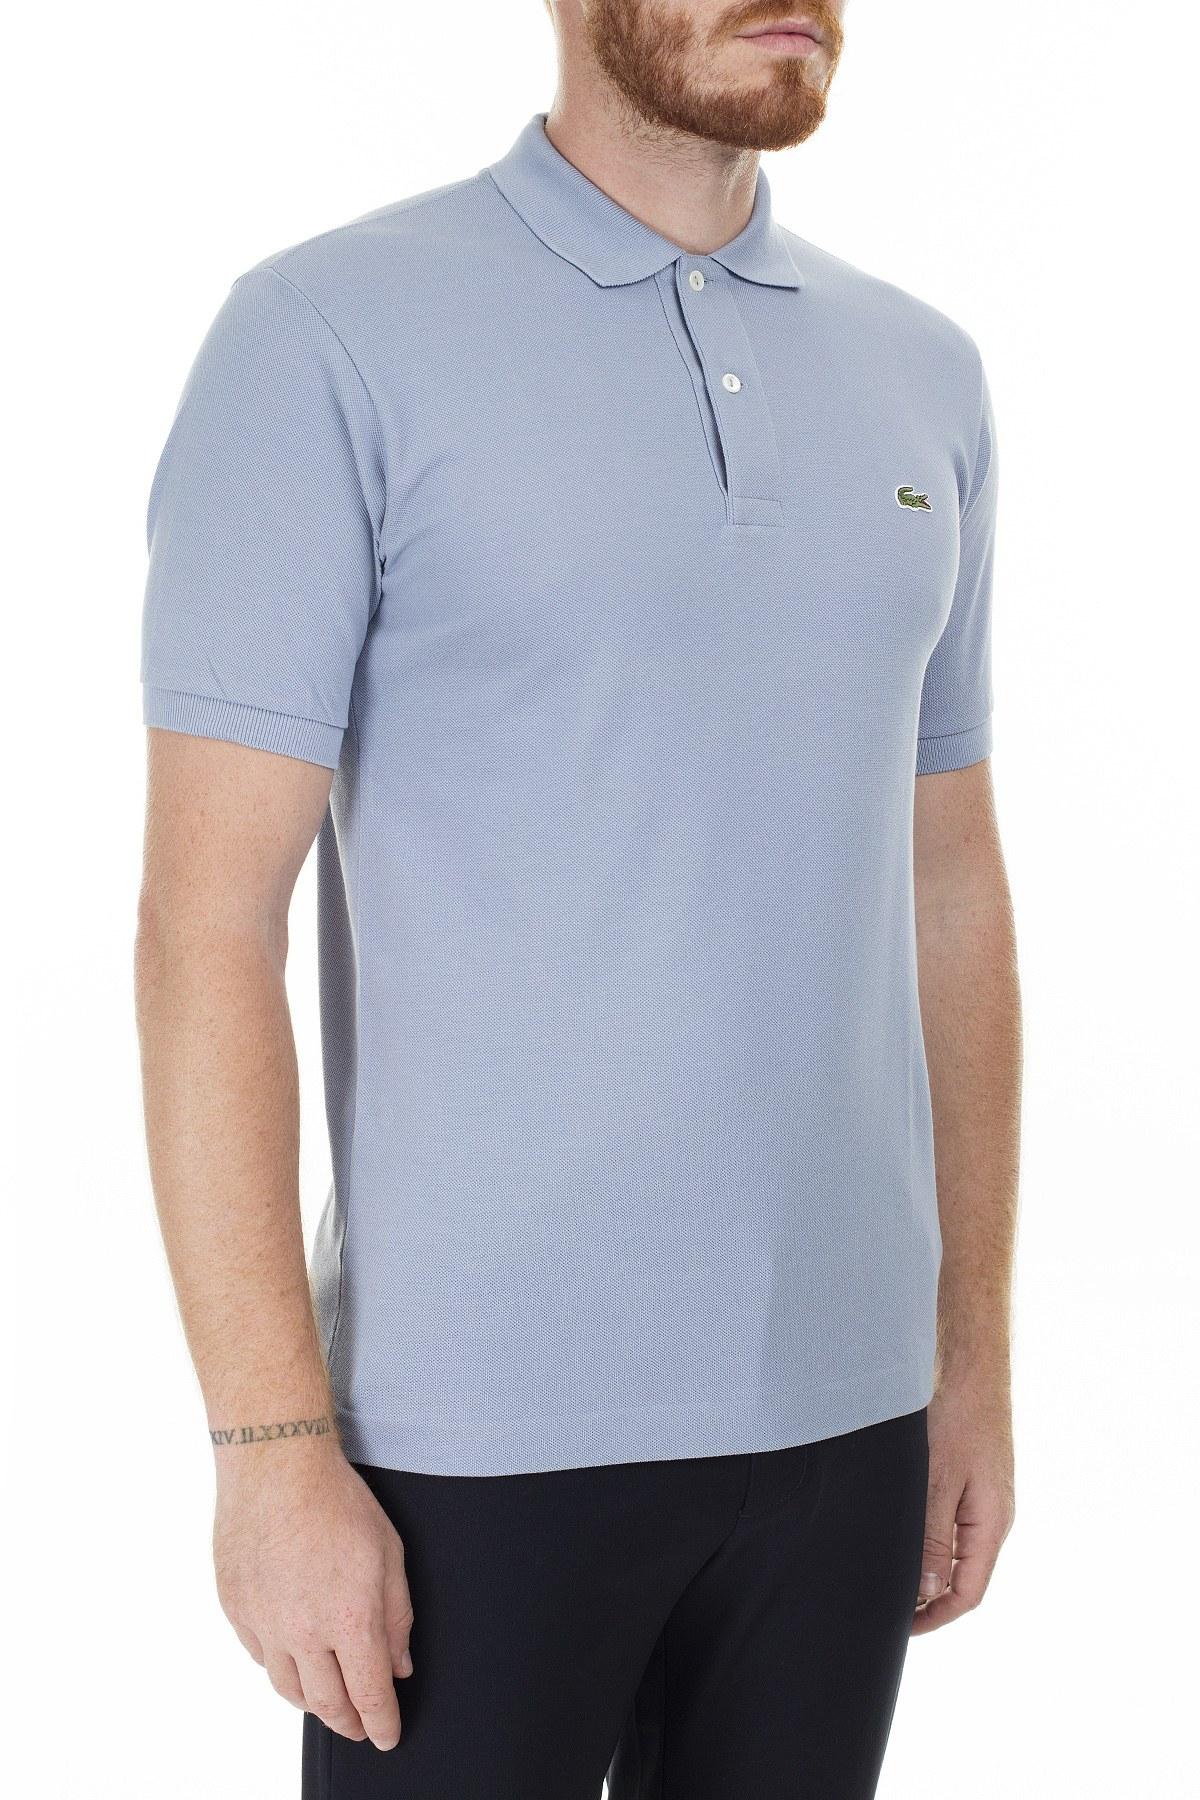 Lacoste Polo Erkek T Shirt S L1212 NU0 AÇIK GRİ